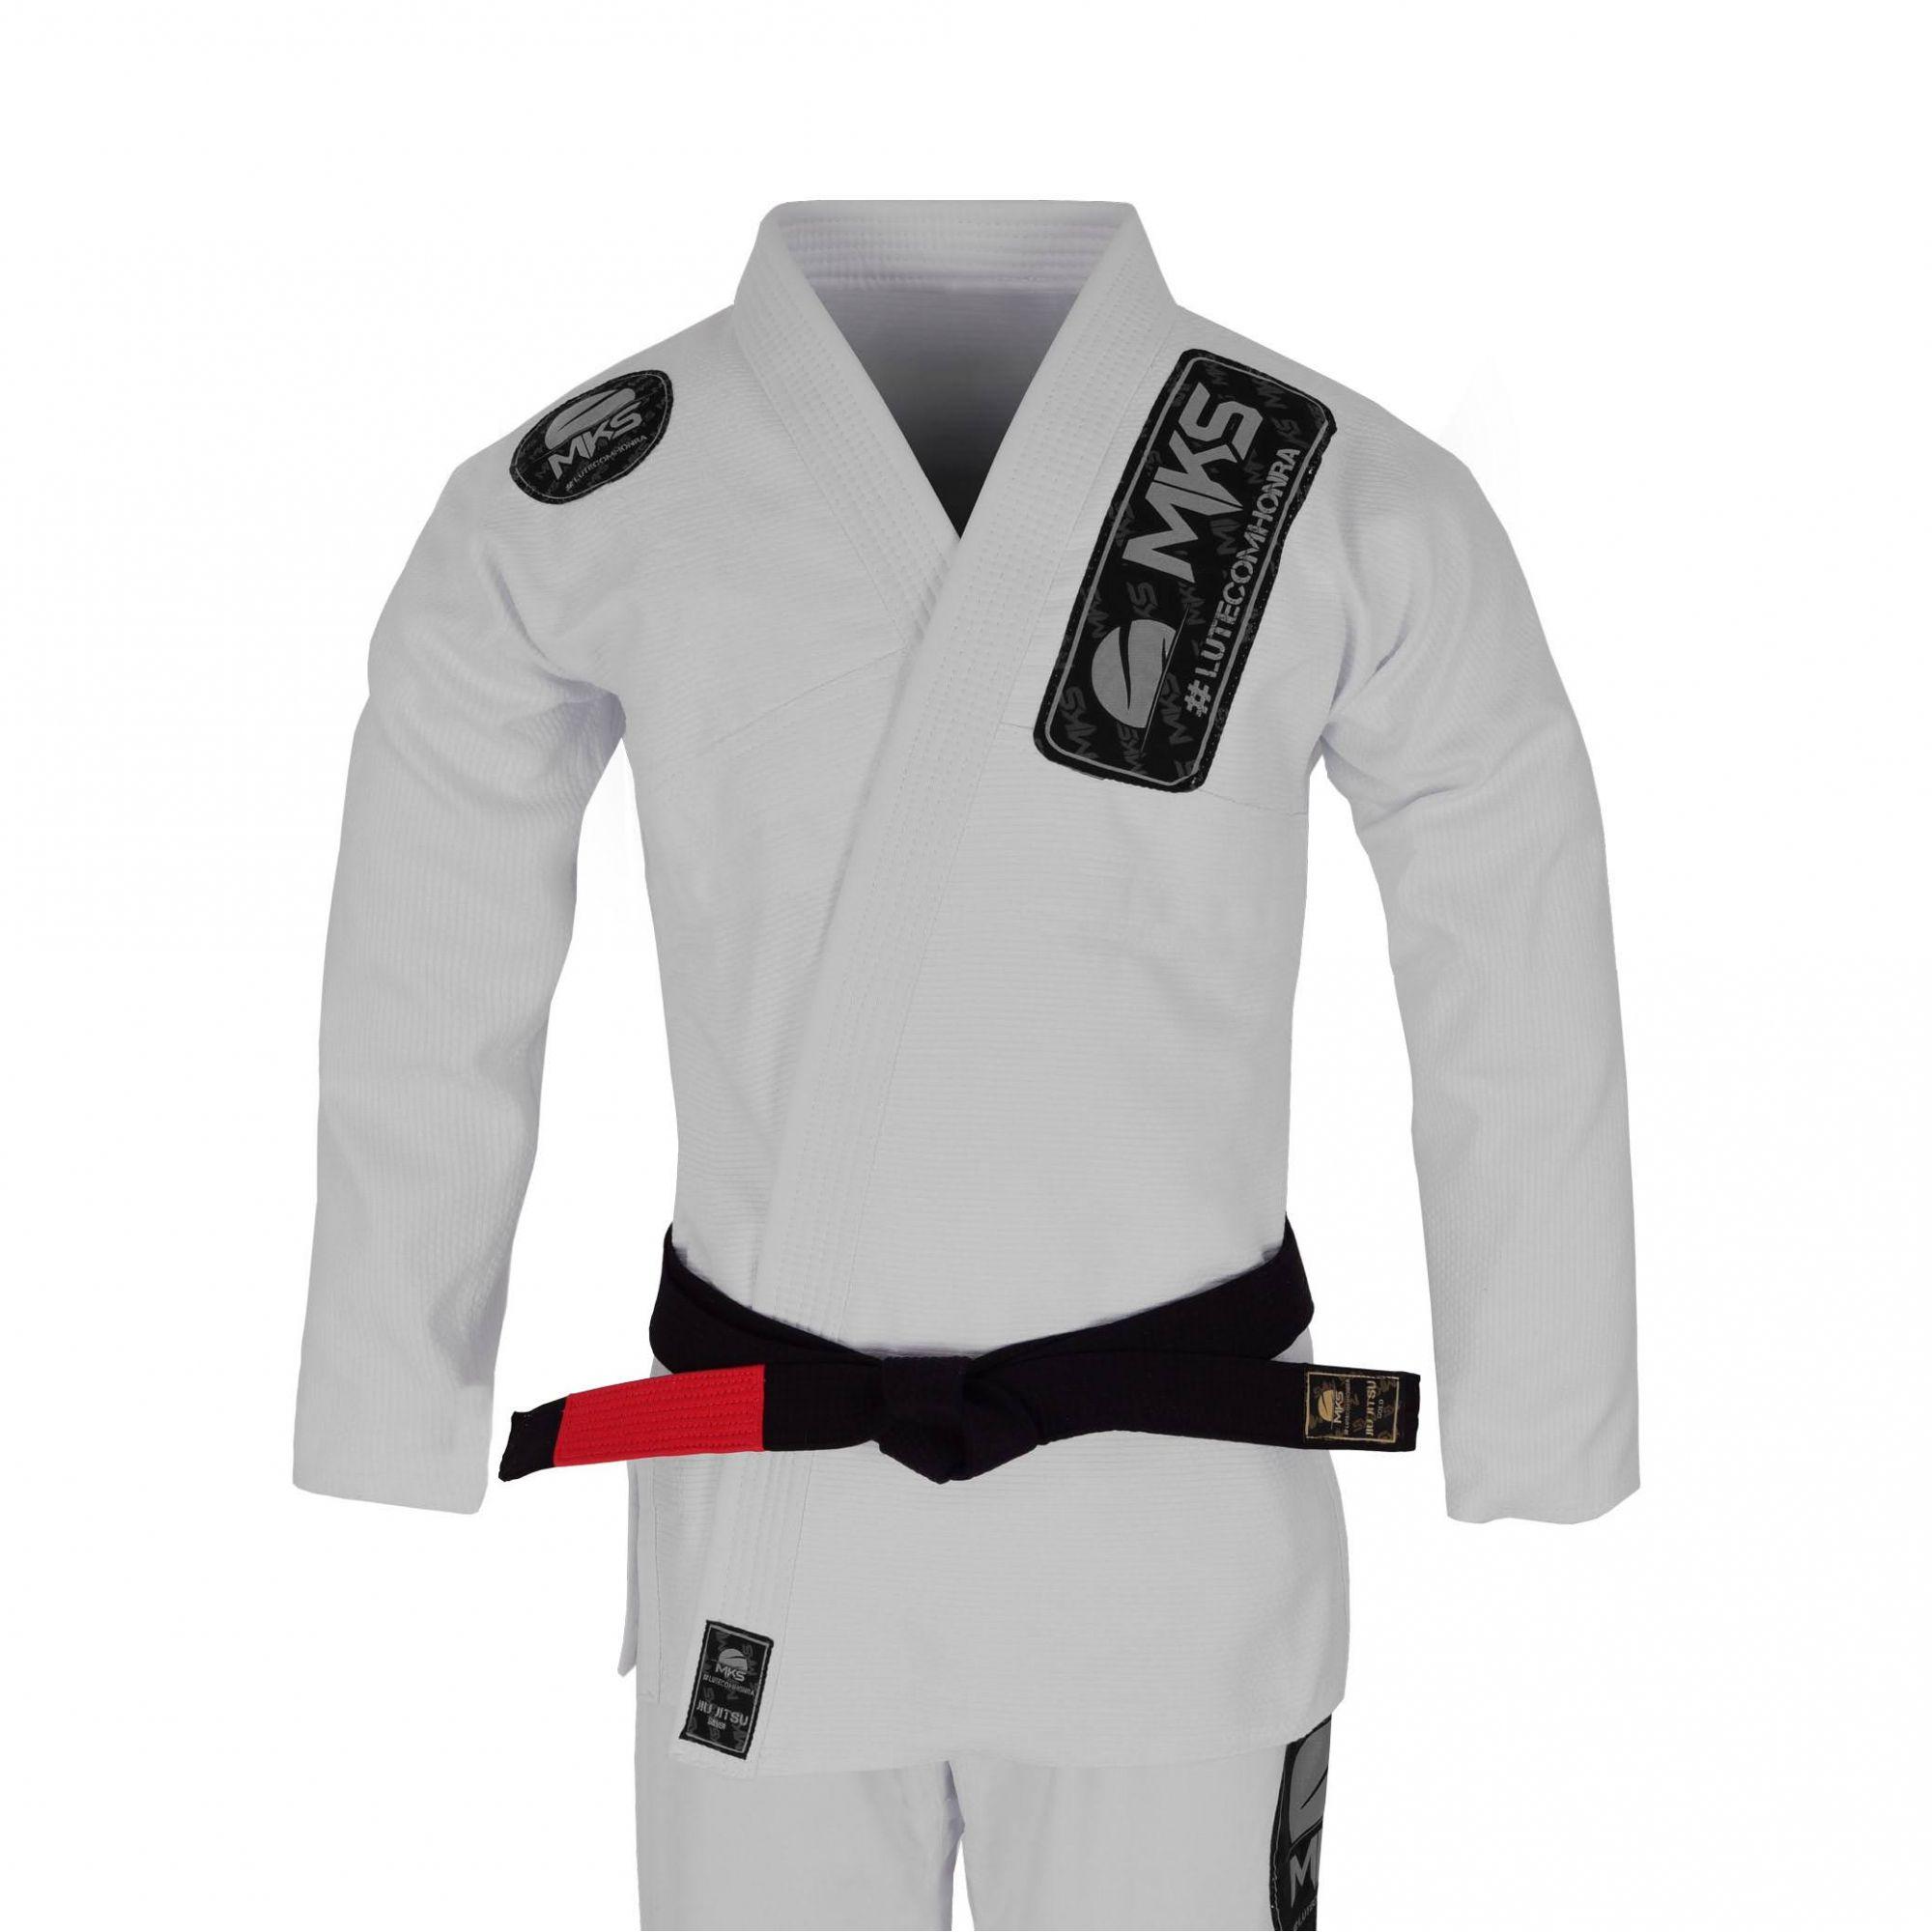 Kimono de Jiu-Jitsu MKS Light Branco